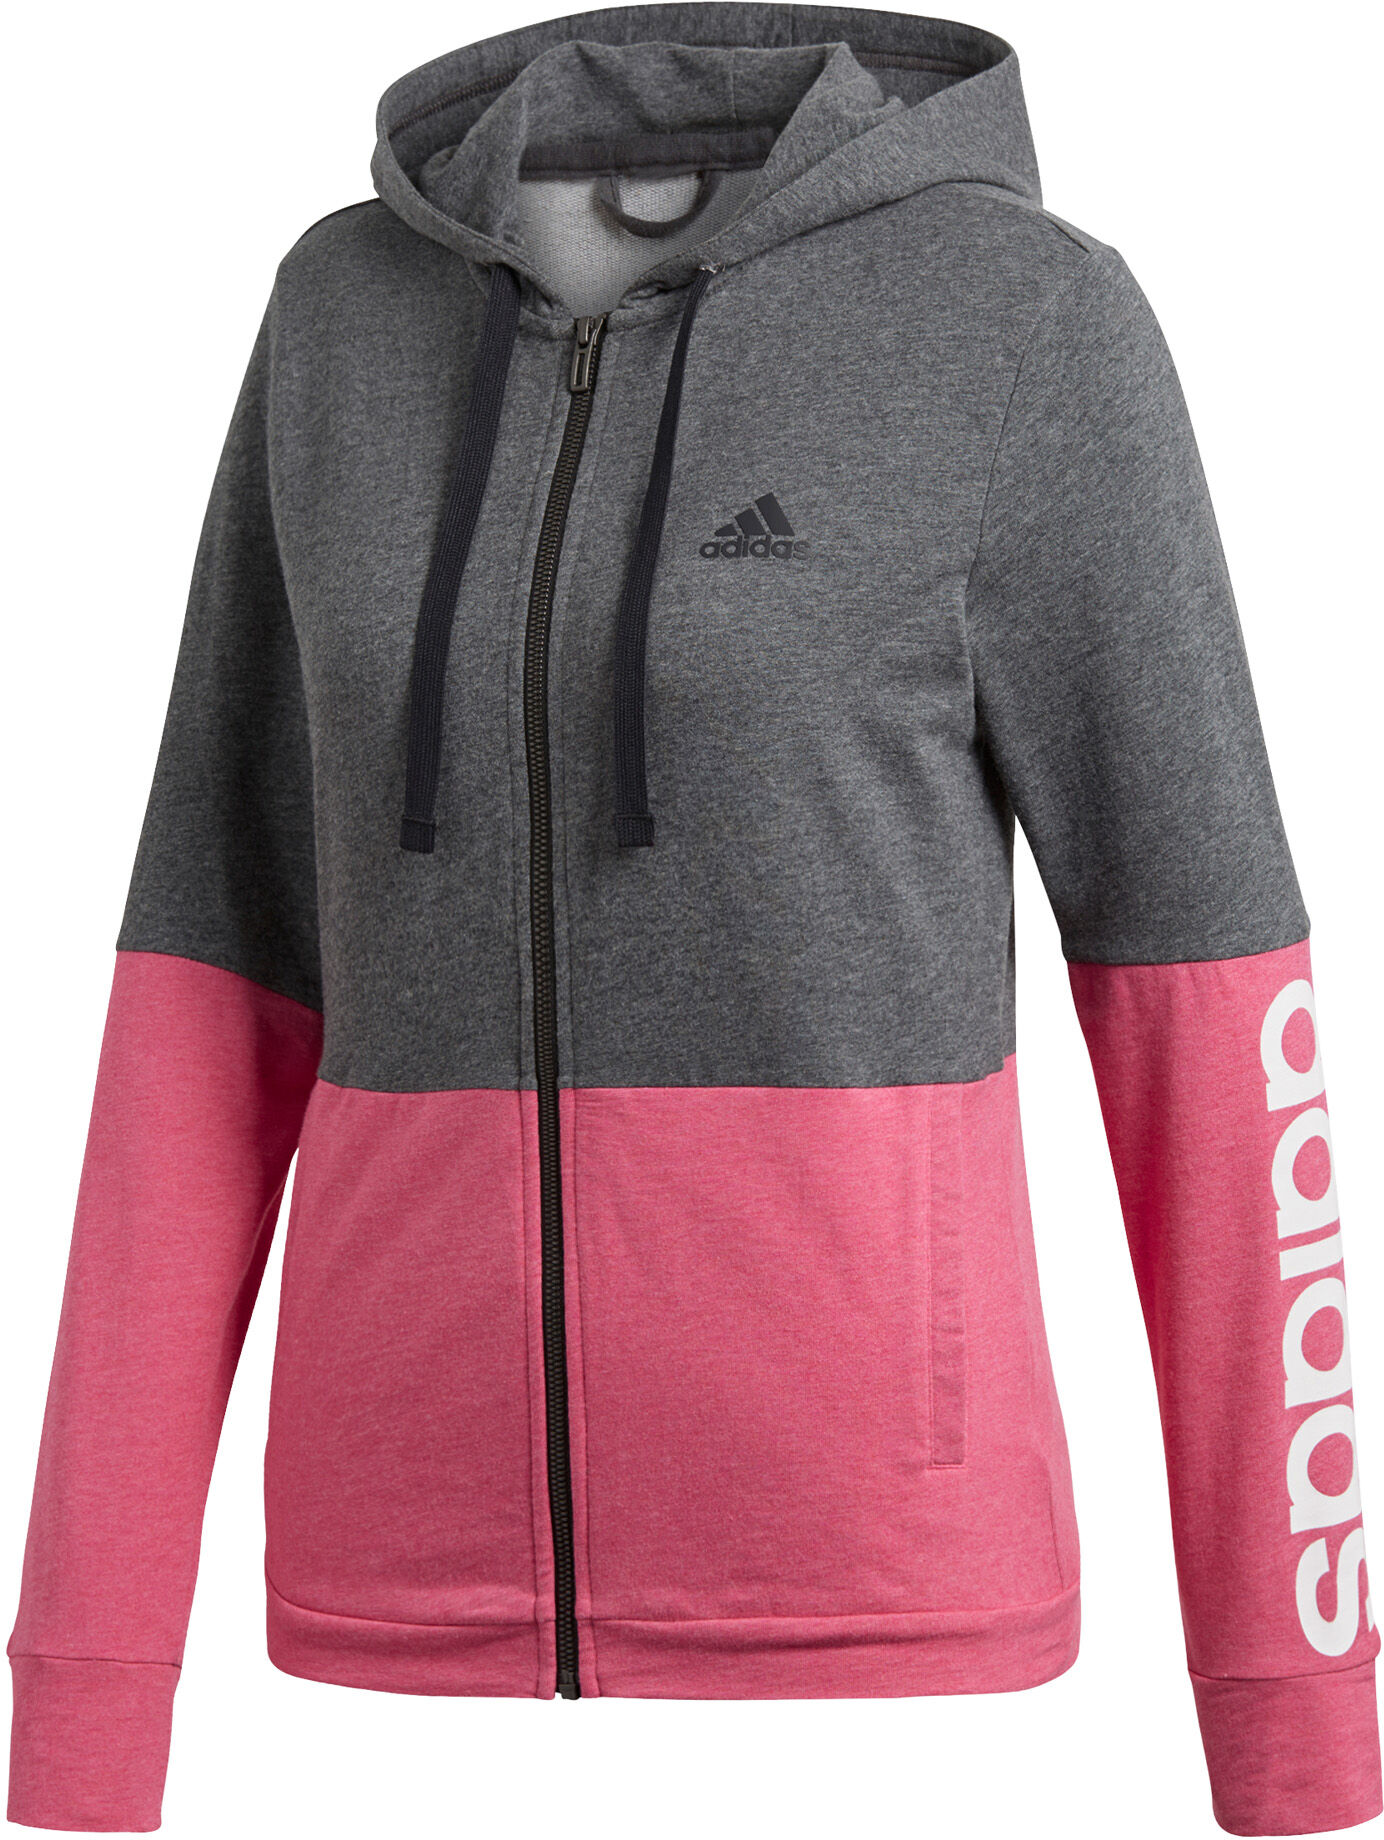 Adidas Herren Trainingsanzug MTS Co Relax (DV2444) in grau